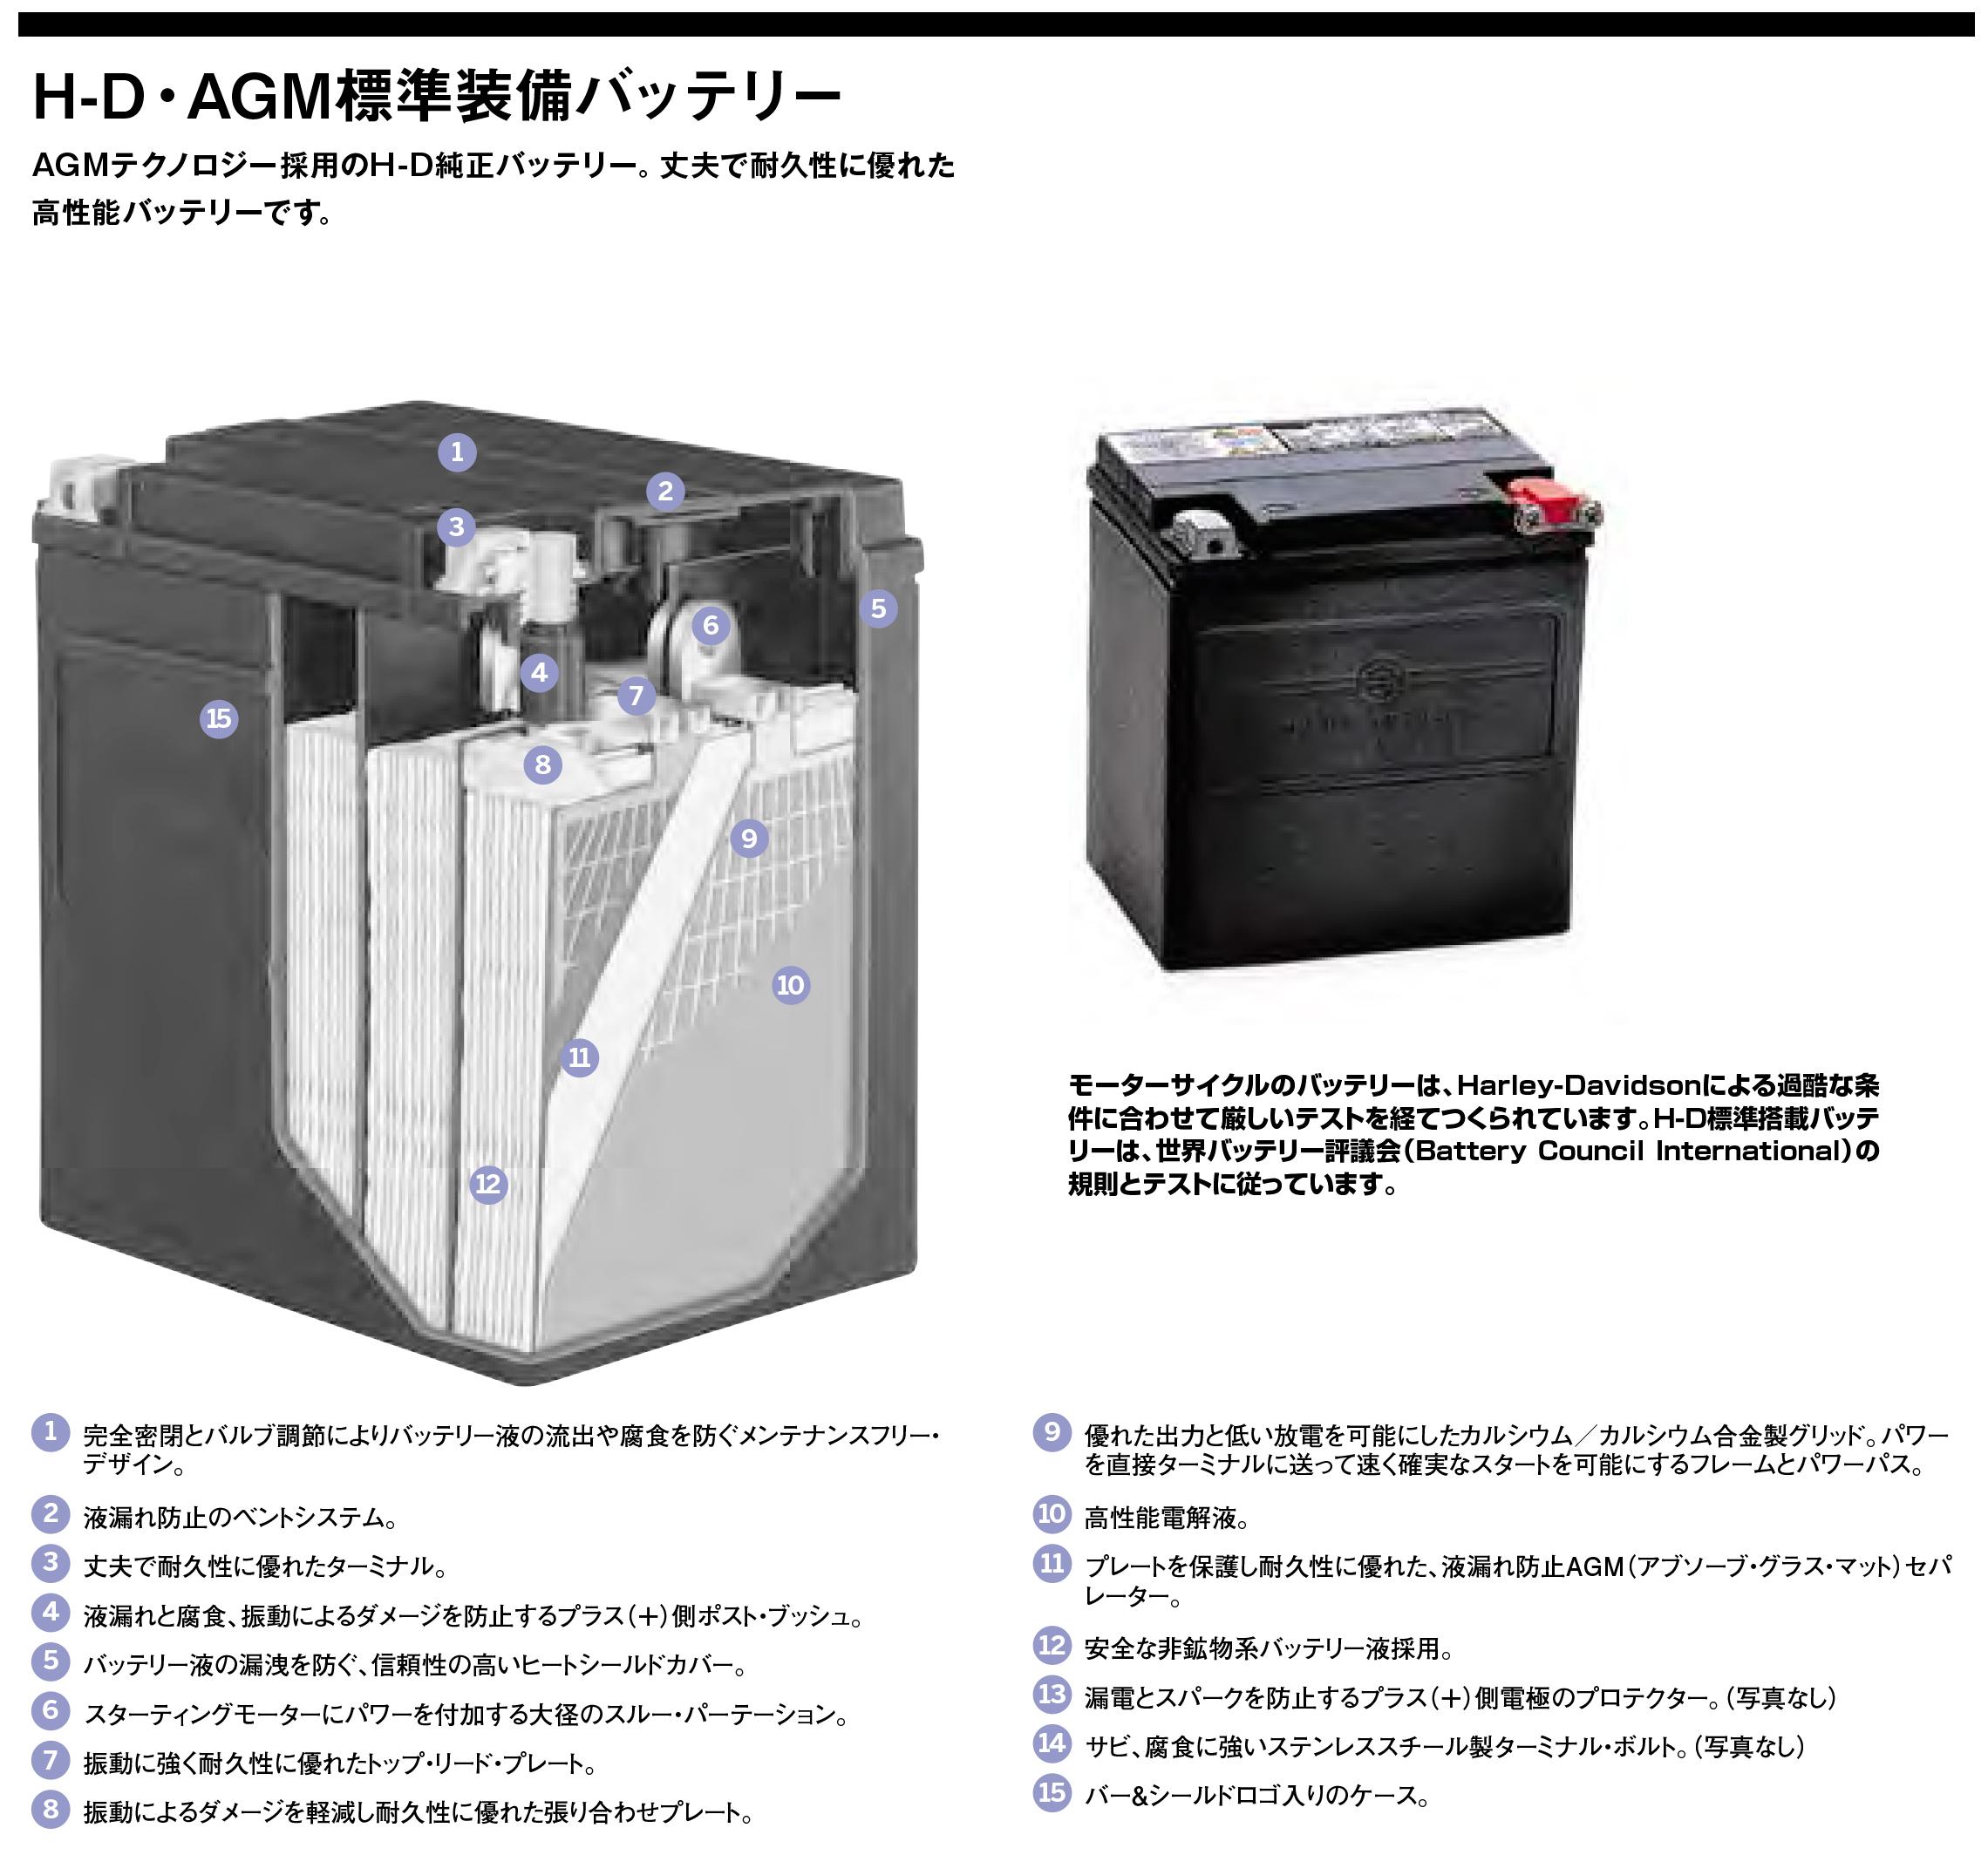 H-D標準装備バッテリー(65958)